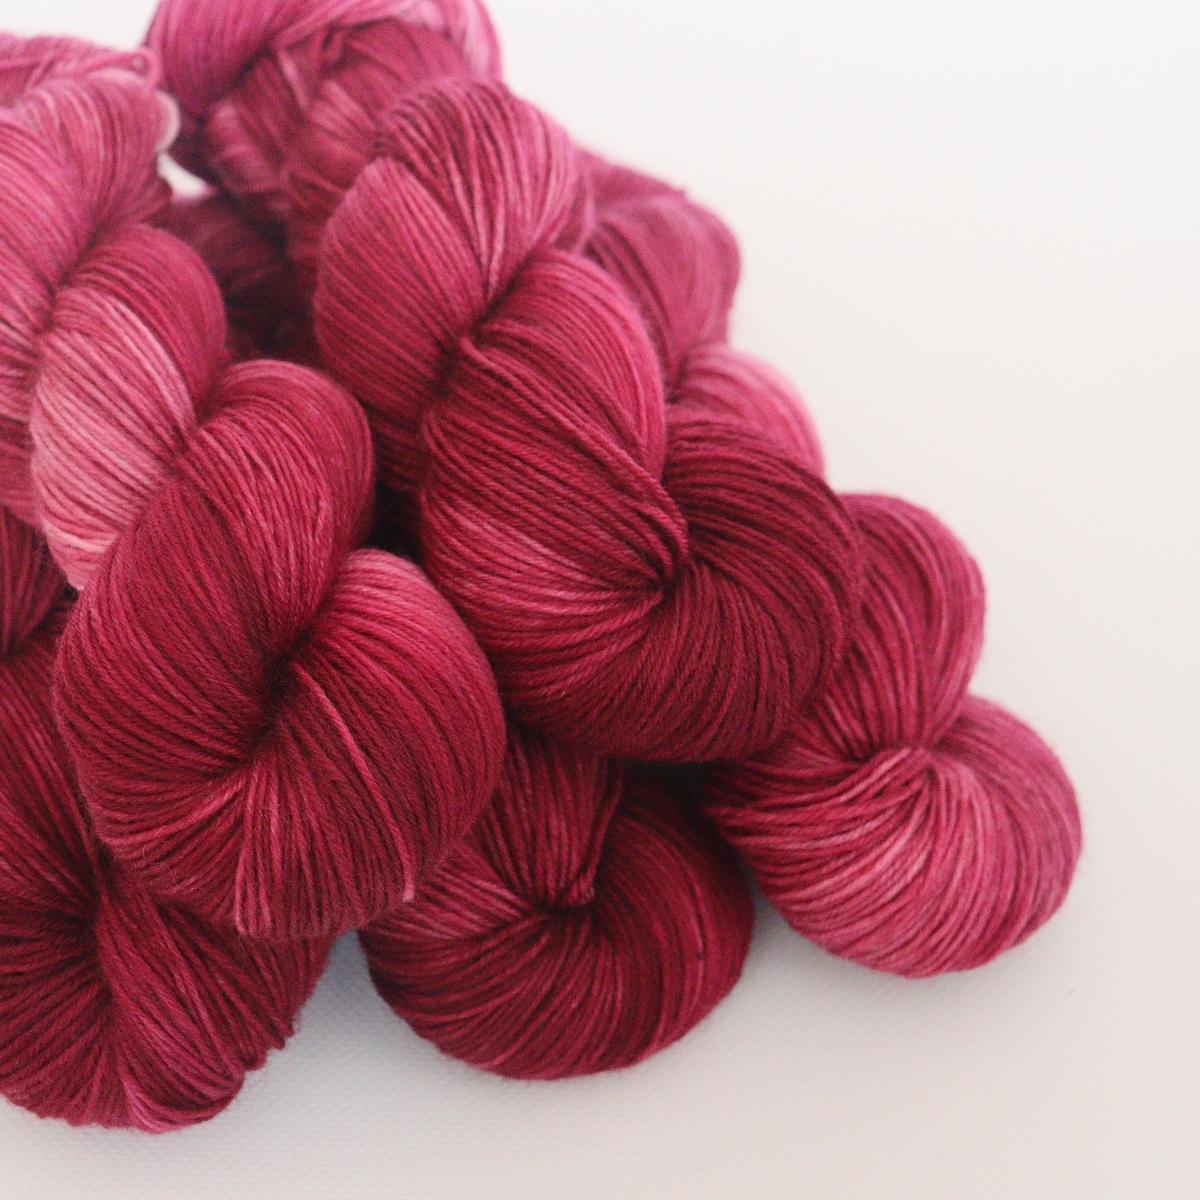 woodico.pro hand dyed yarn 065 2 1200x1200 - Hand dyed yarn / 065